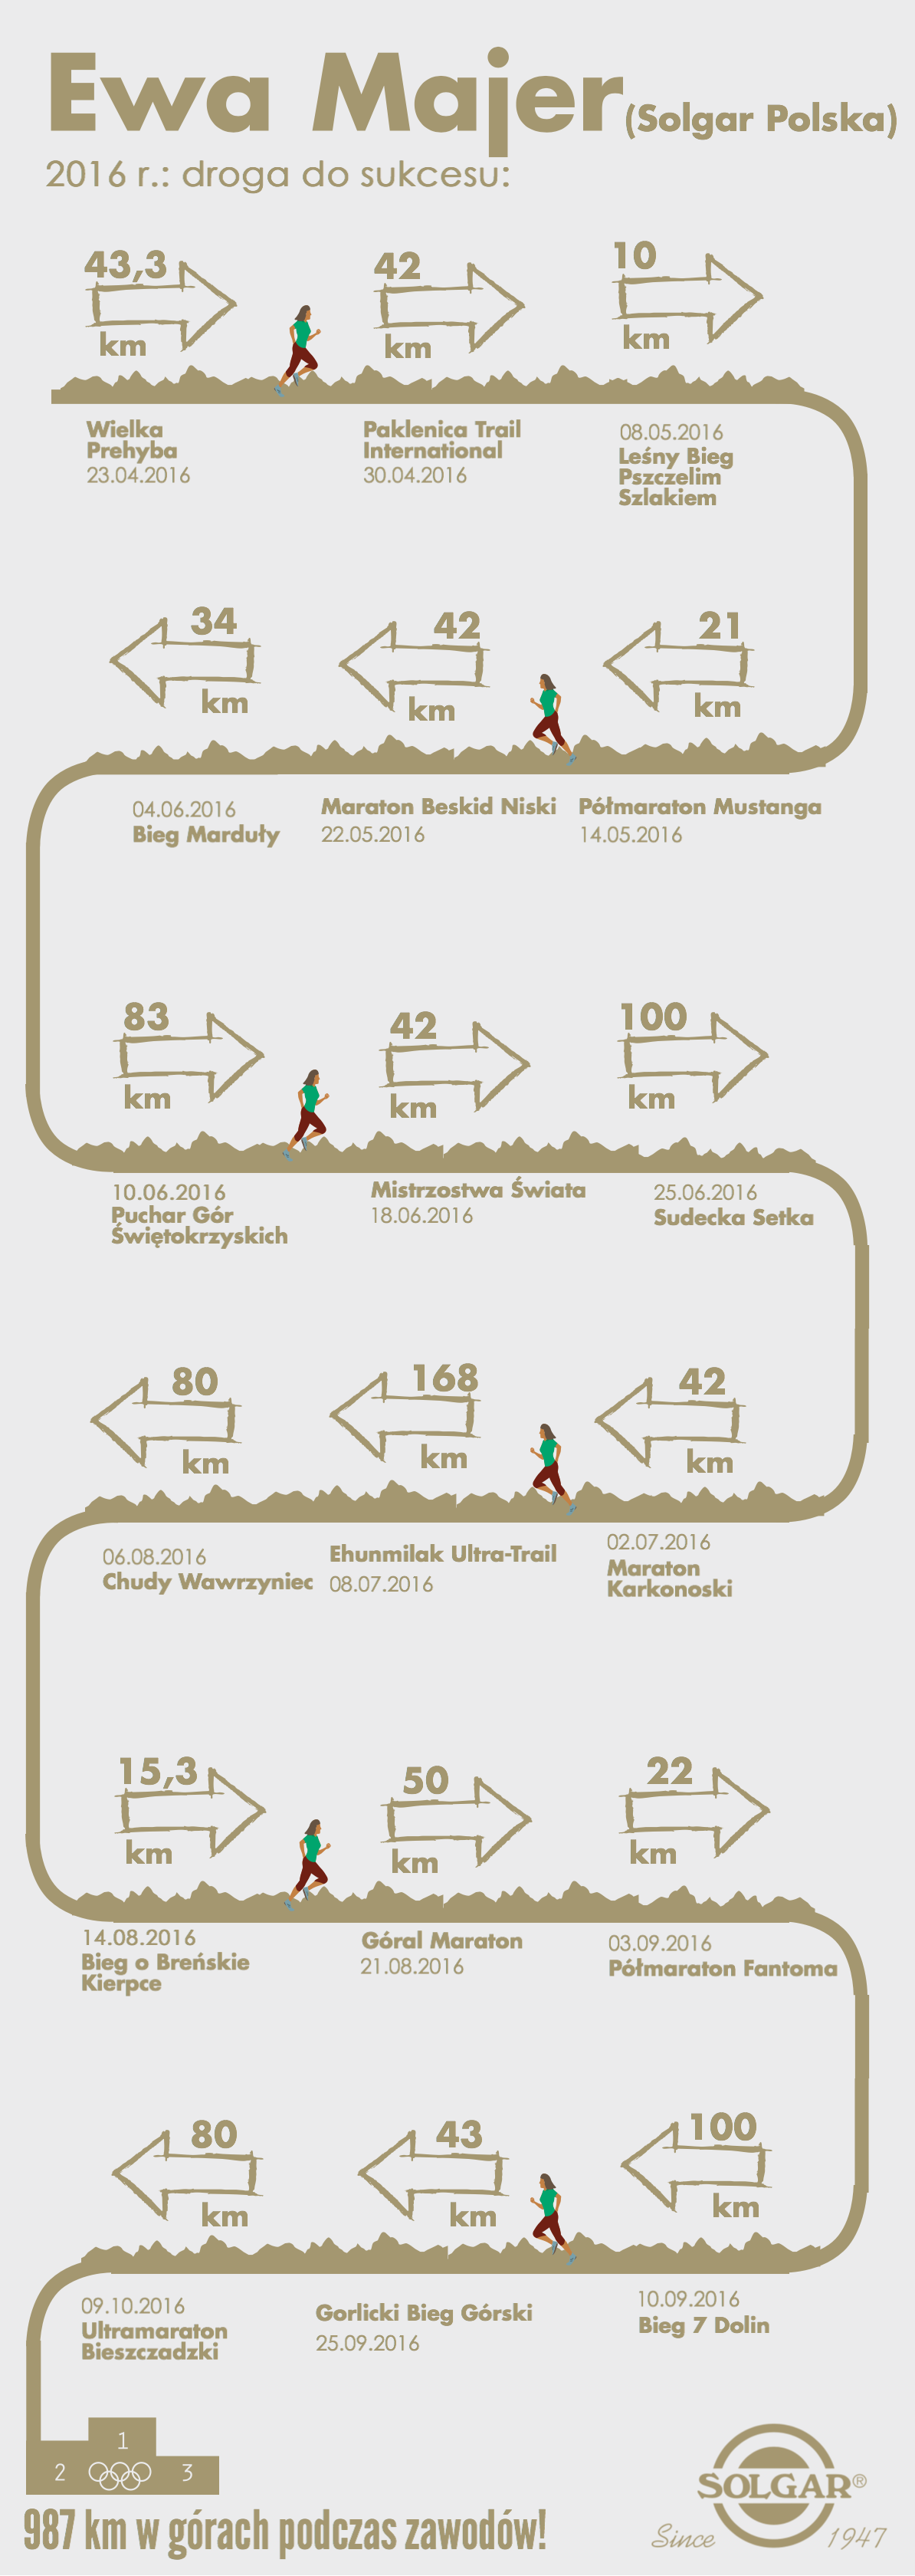 ewa majer 2016 infografika